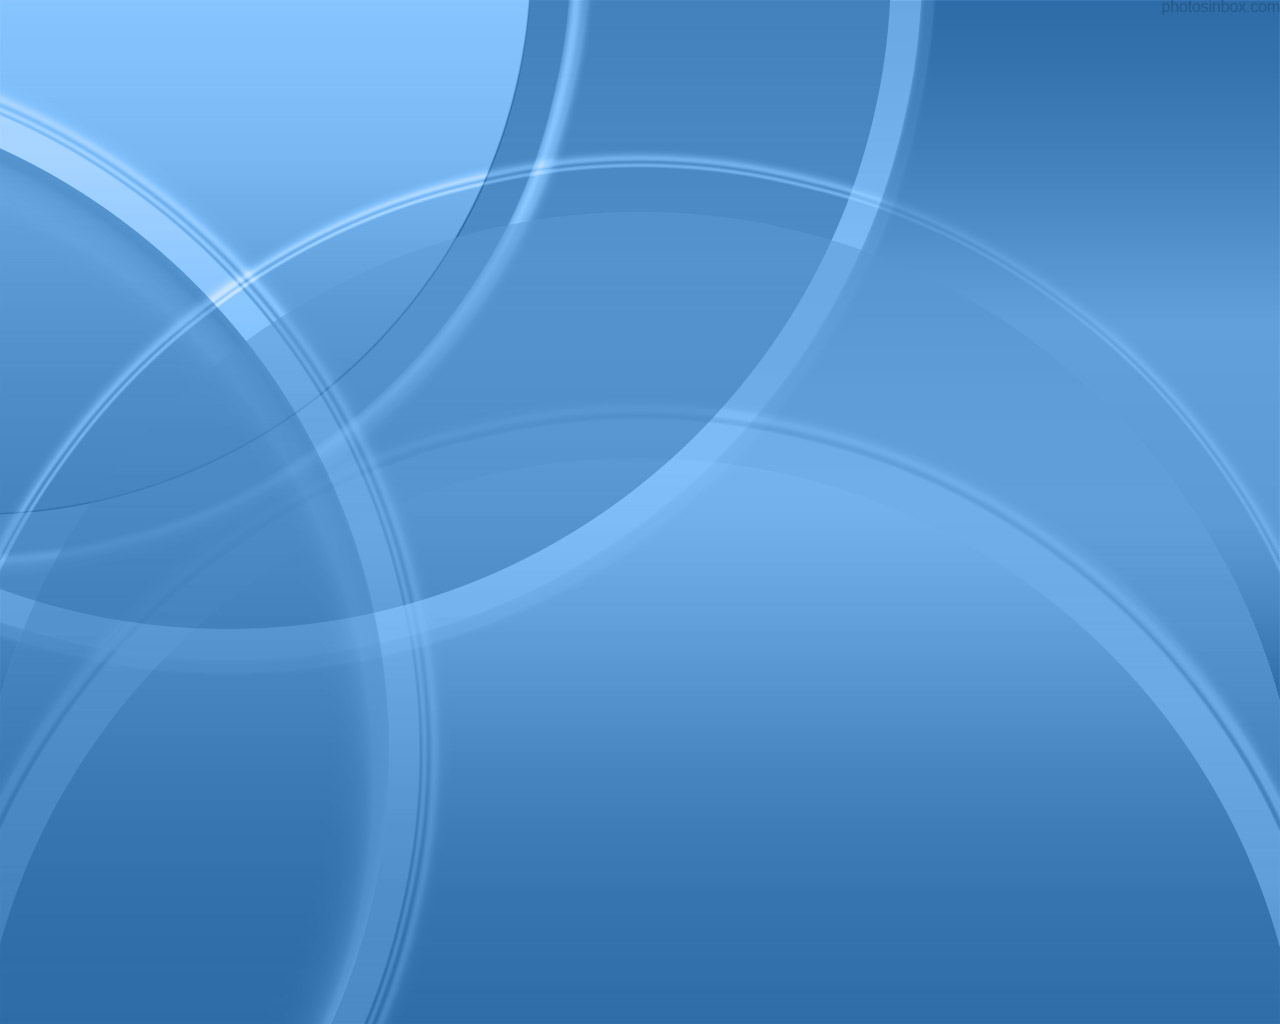 Abstract blue background PhotosInBox 1280x1024